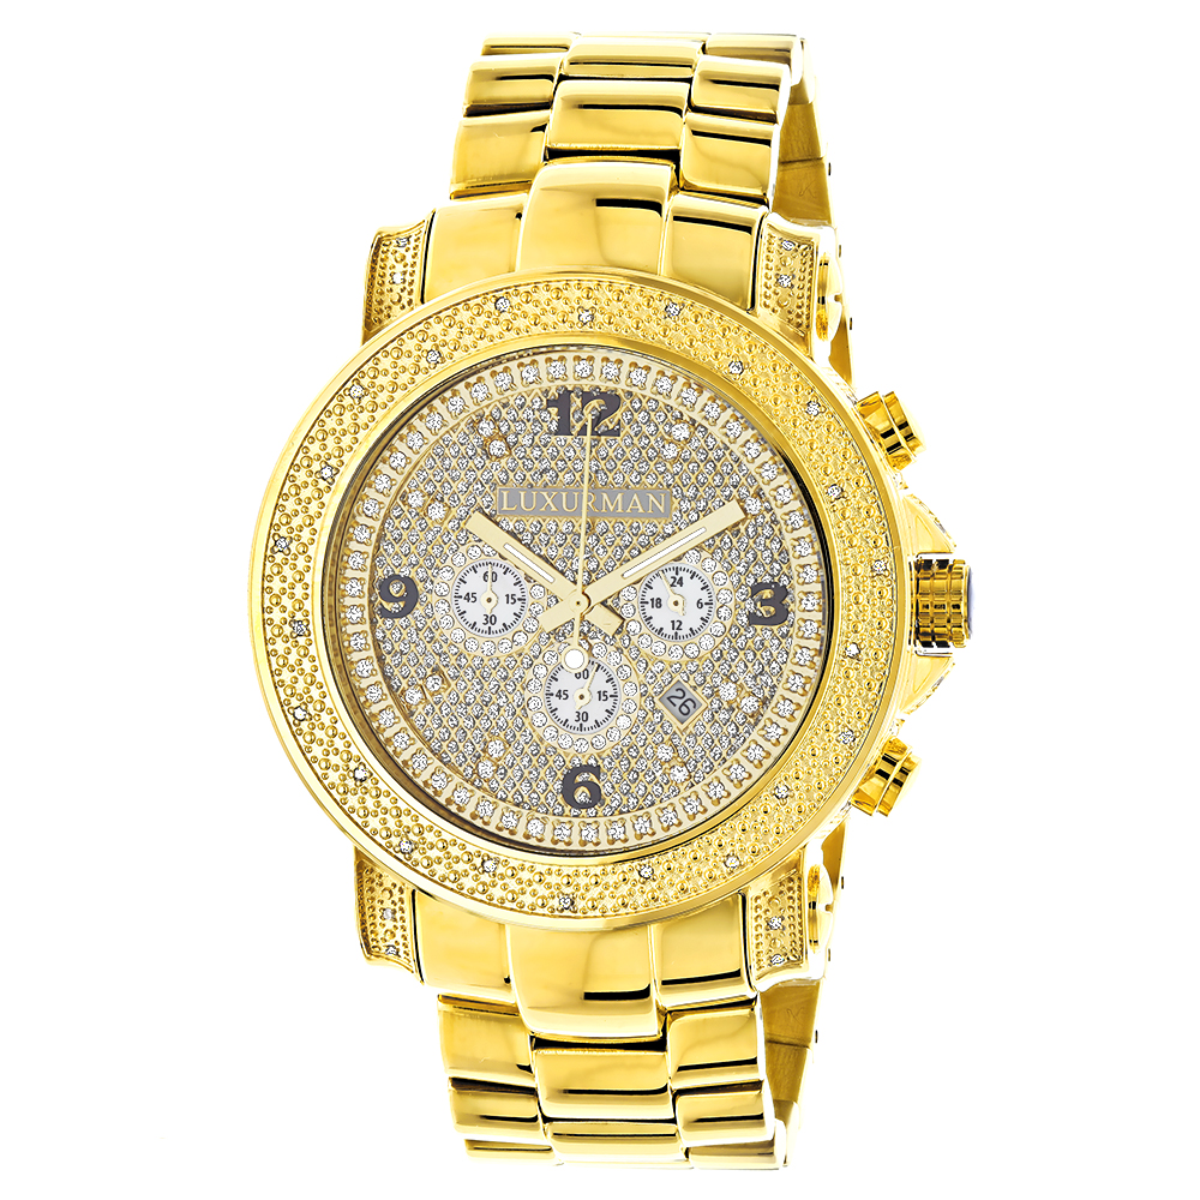 Luxurman Watches Mens Oversized Diamond Watch 0.75ct Yellow Gold